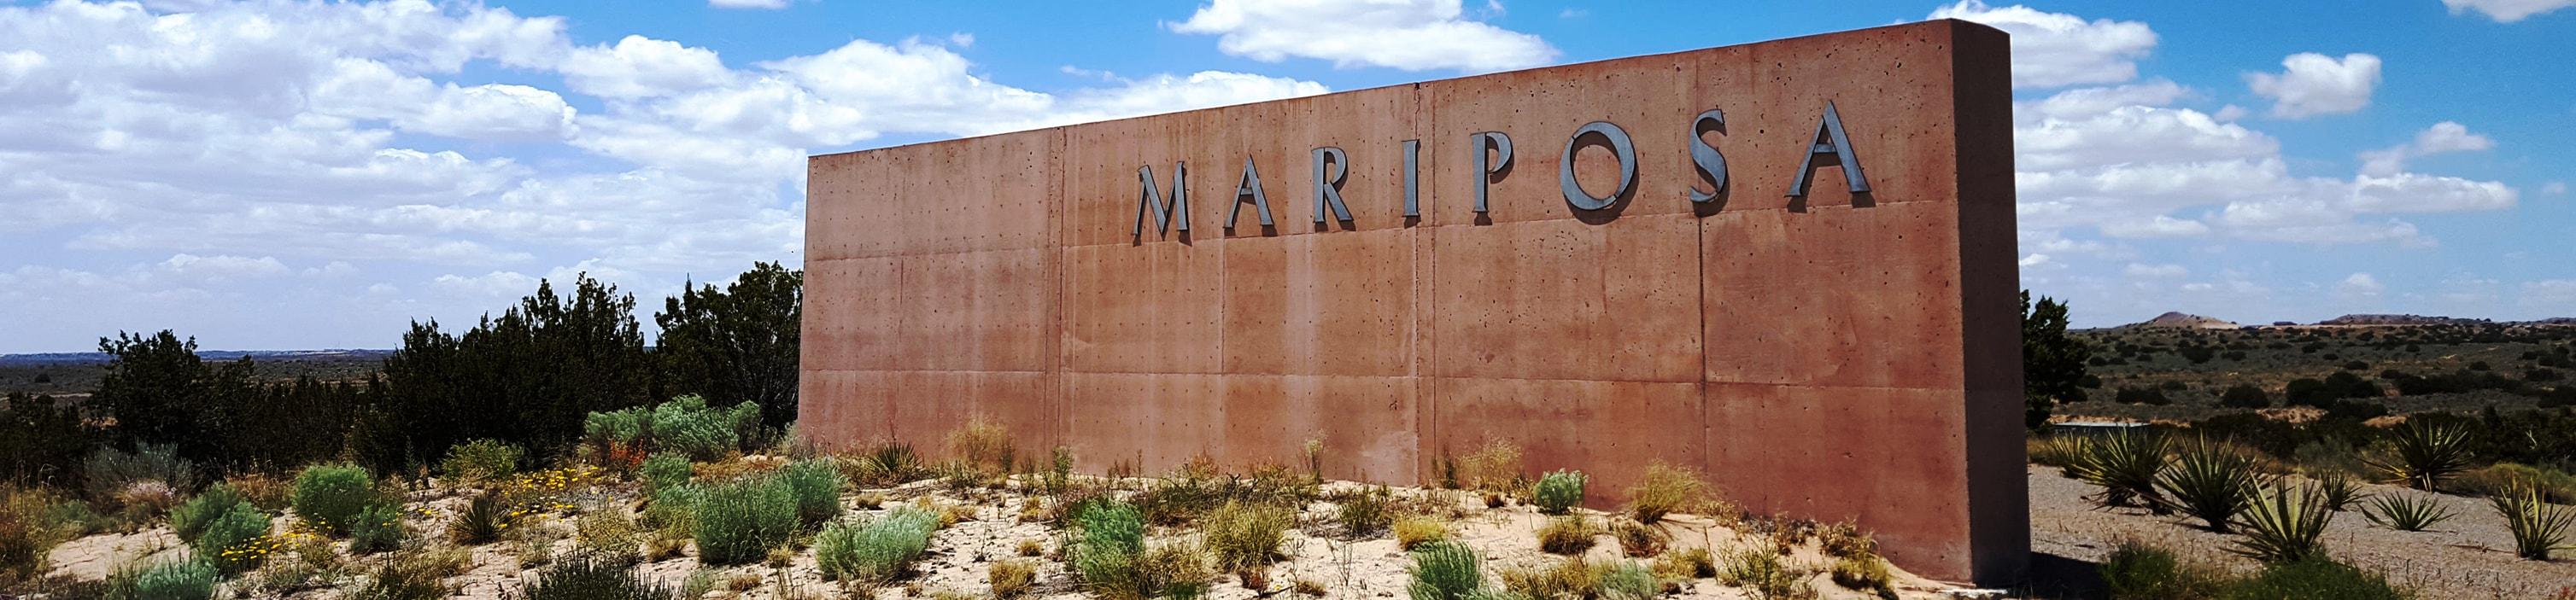 Mariposa Rio Rancho